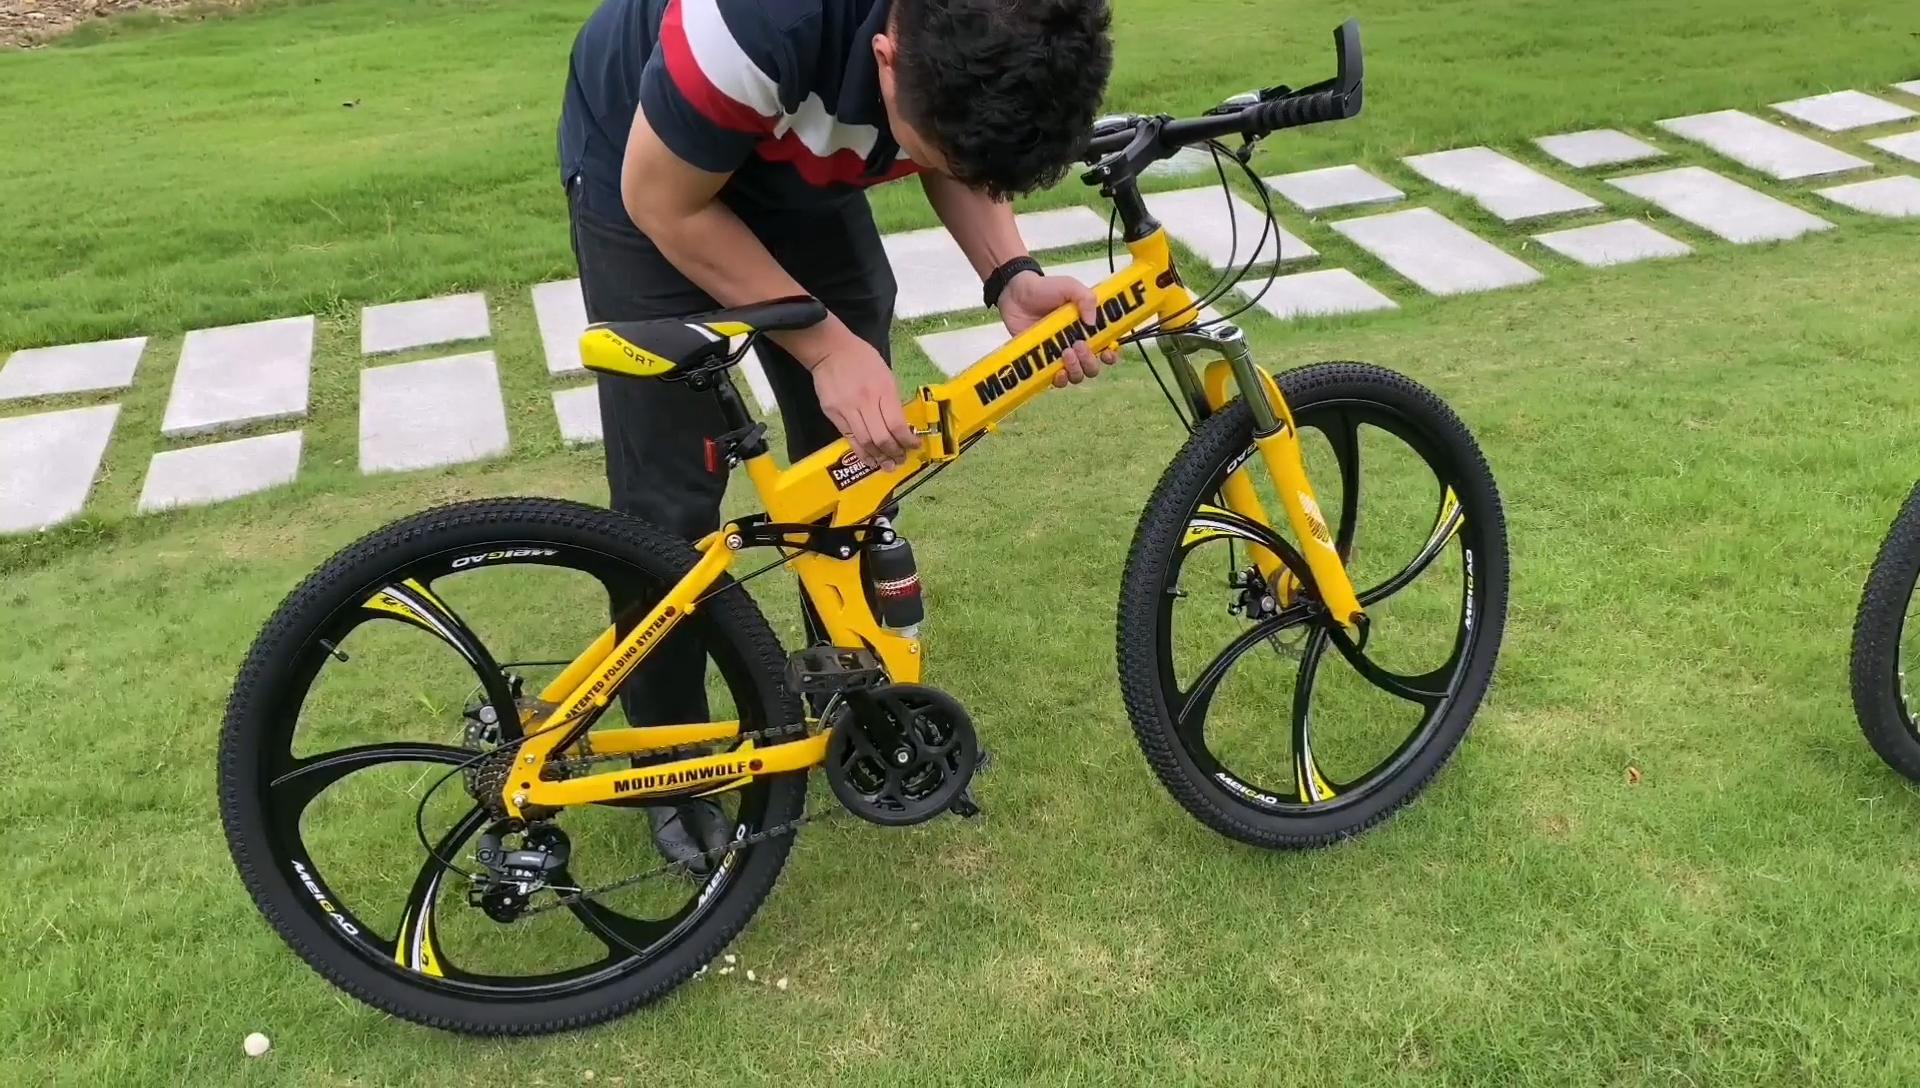 वयस्क 20 26 इंच सस्ते चक्र, एल्यूमीनियम मिश्र धातु शहर पहाड़ साइकिल 26 ''वसा टायर प्रकाश वजन पहाड़ बाइक साइकिल/